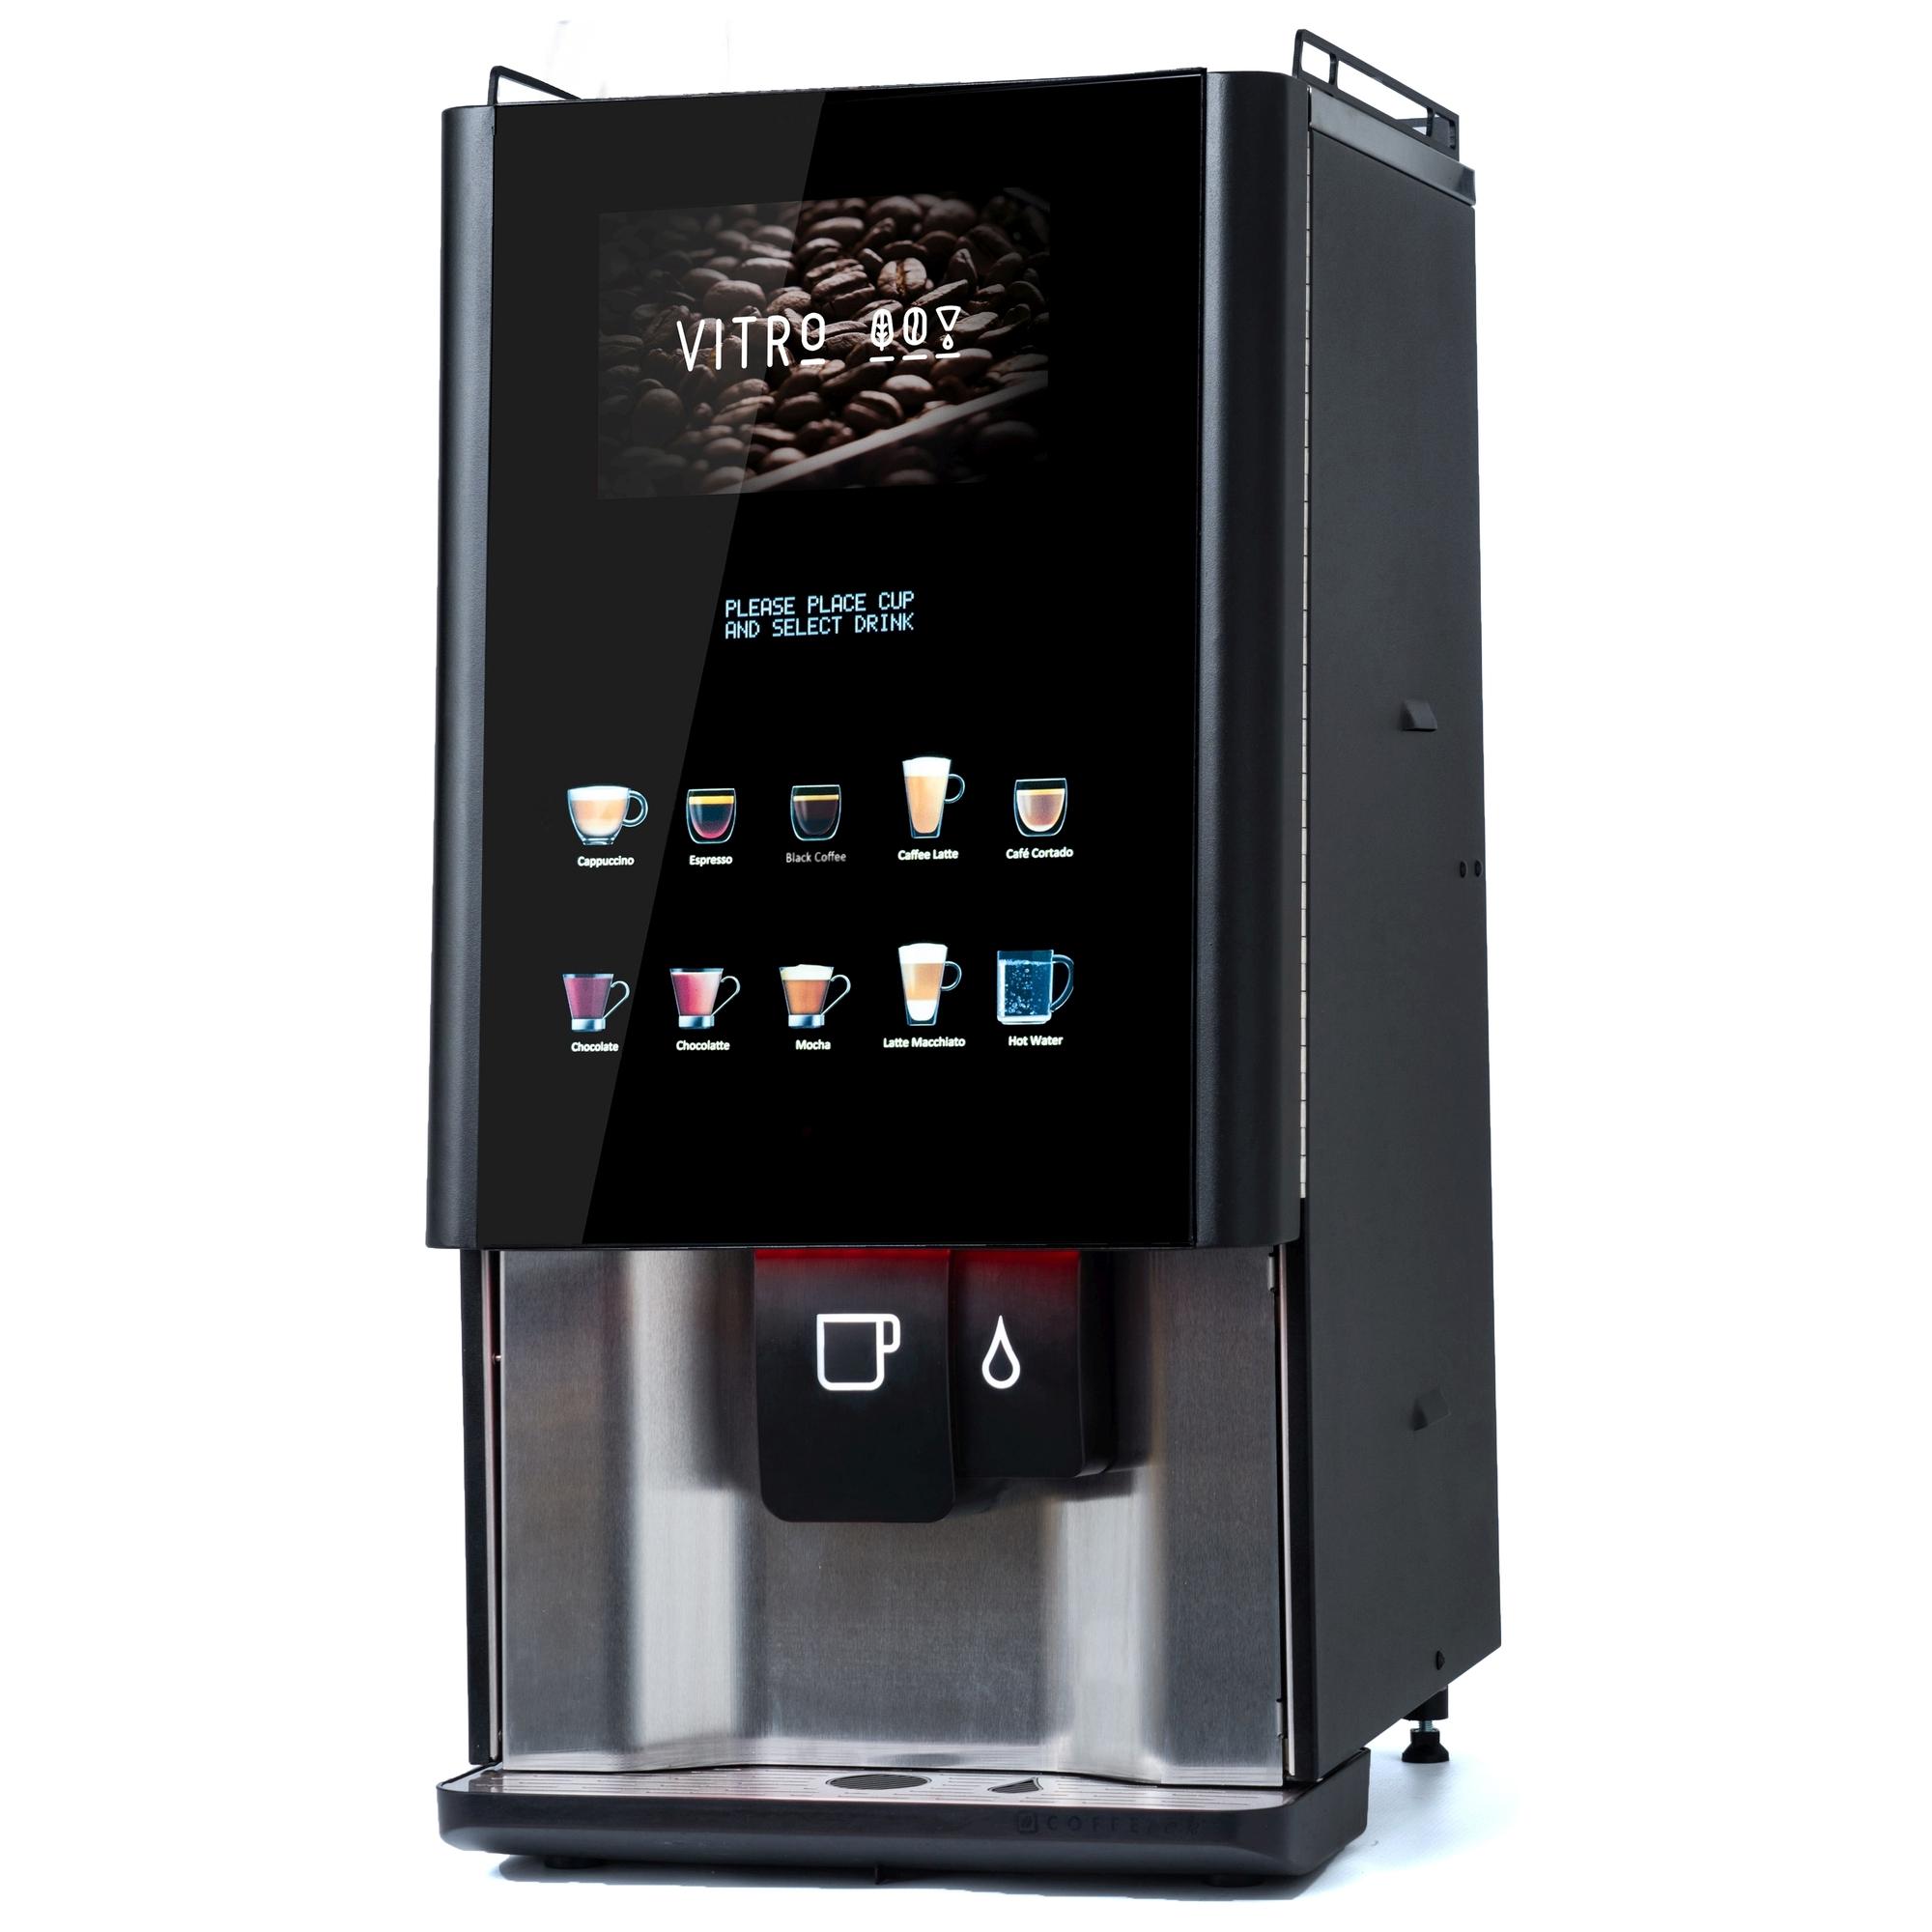 Vitro S4 Coffee Machine